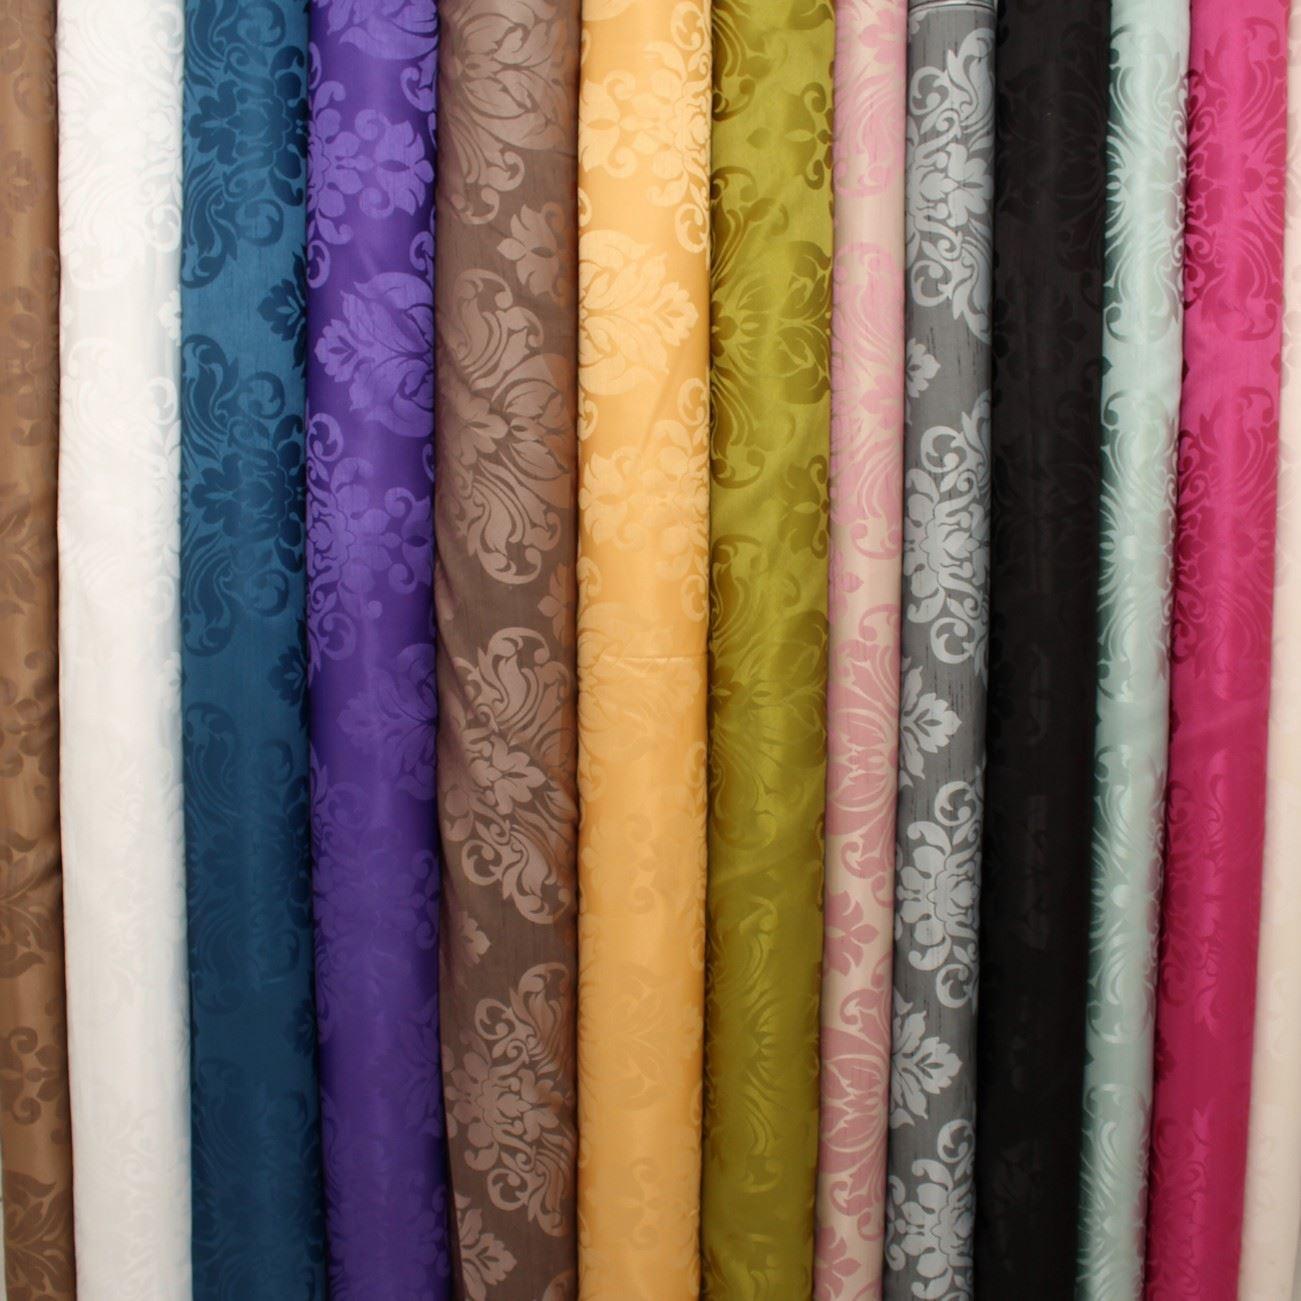 Stoff Färben klassisch blumenmuster kunstseide jacquard vorhang polster stoff